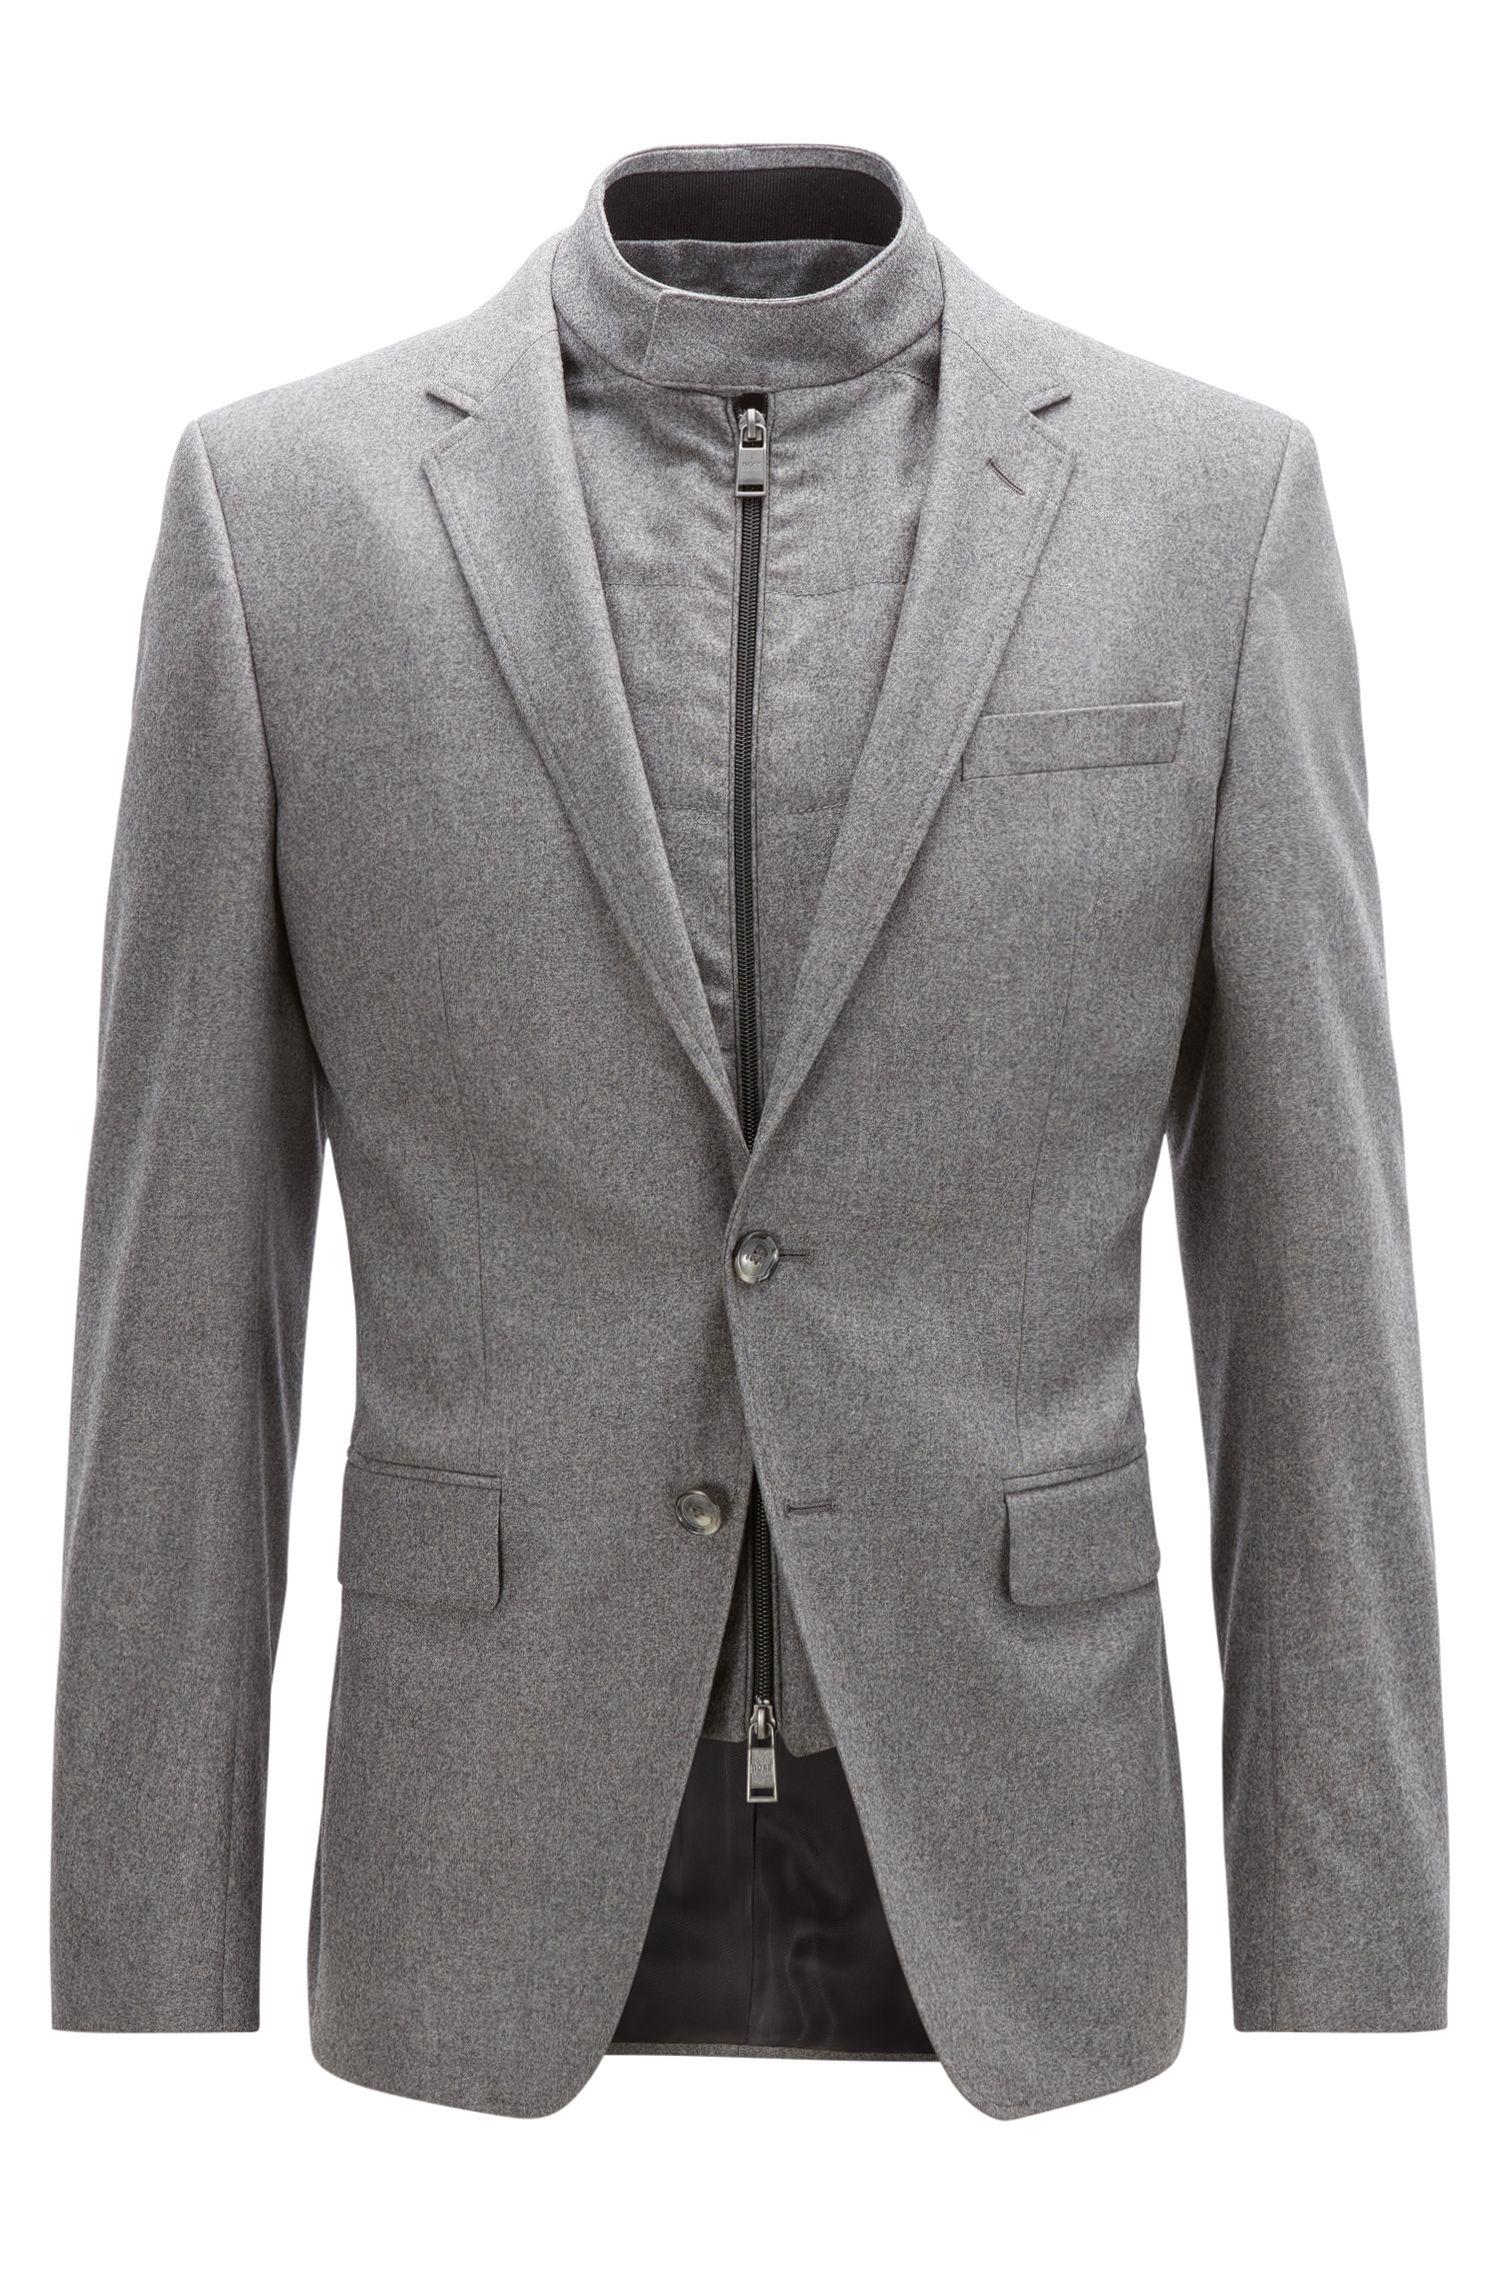 Stretch Virgin Wool-Cashmere Sport Coat, Slim Fit | Hadwart